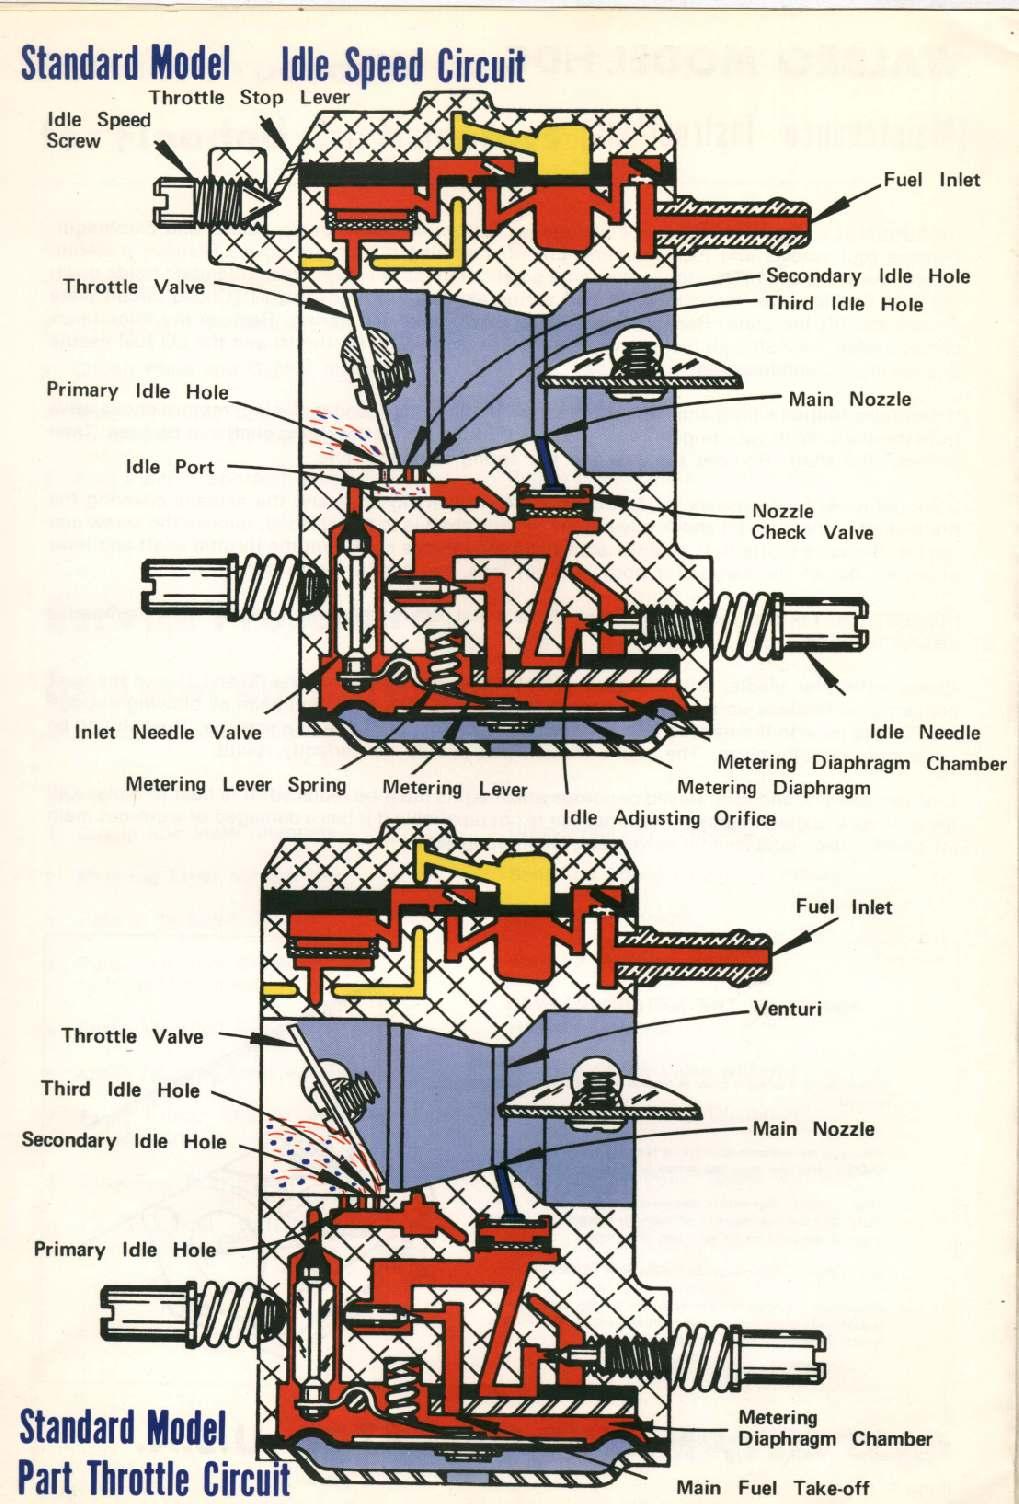 weed eater carburetor diagram electrical wiring light switch diagrams dan's motorcycle